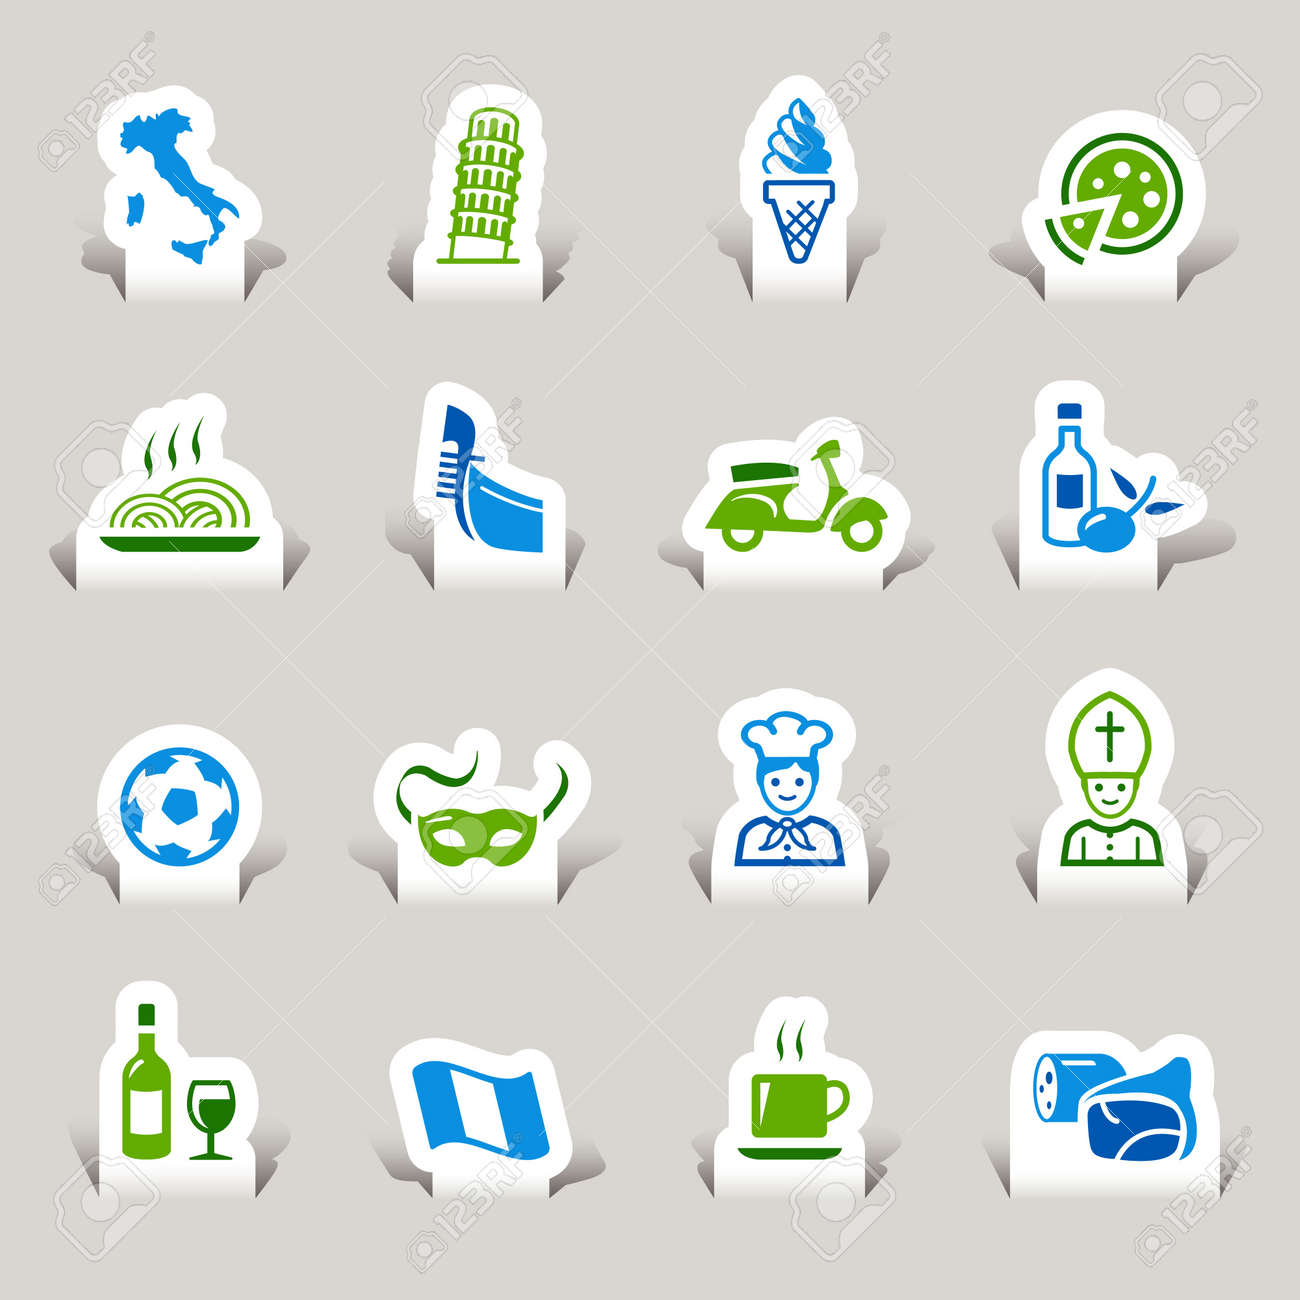 Paper Cut - Italian Icons Stock Vector - 12174623